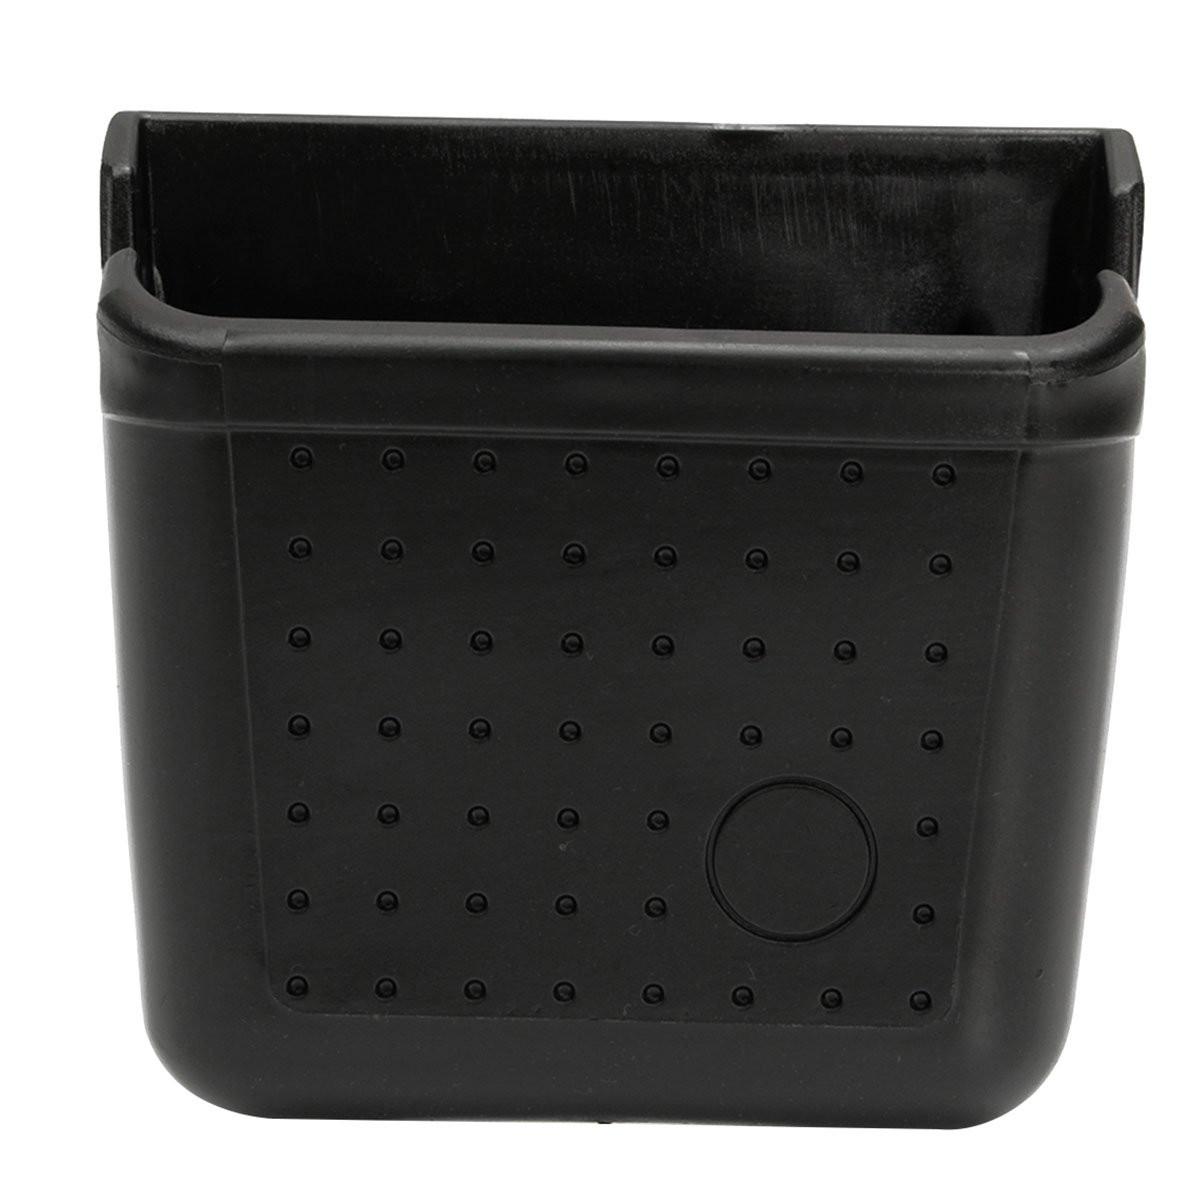 Auto Phone Charging Car Storage Box Universal MobilePhone Pouch Bag Bluetooth Pylon Multi-use Store Holder Pockets Organizer(China (Mainland))